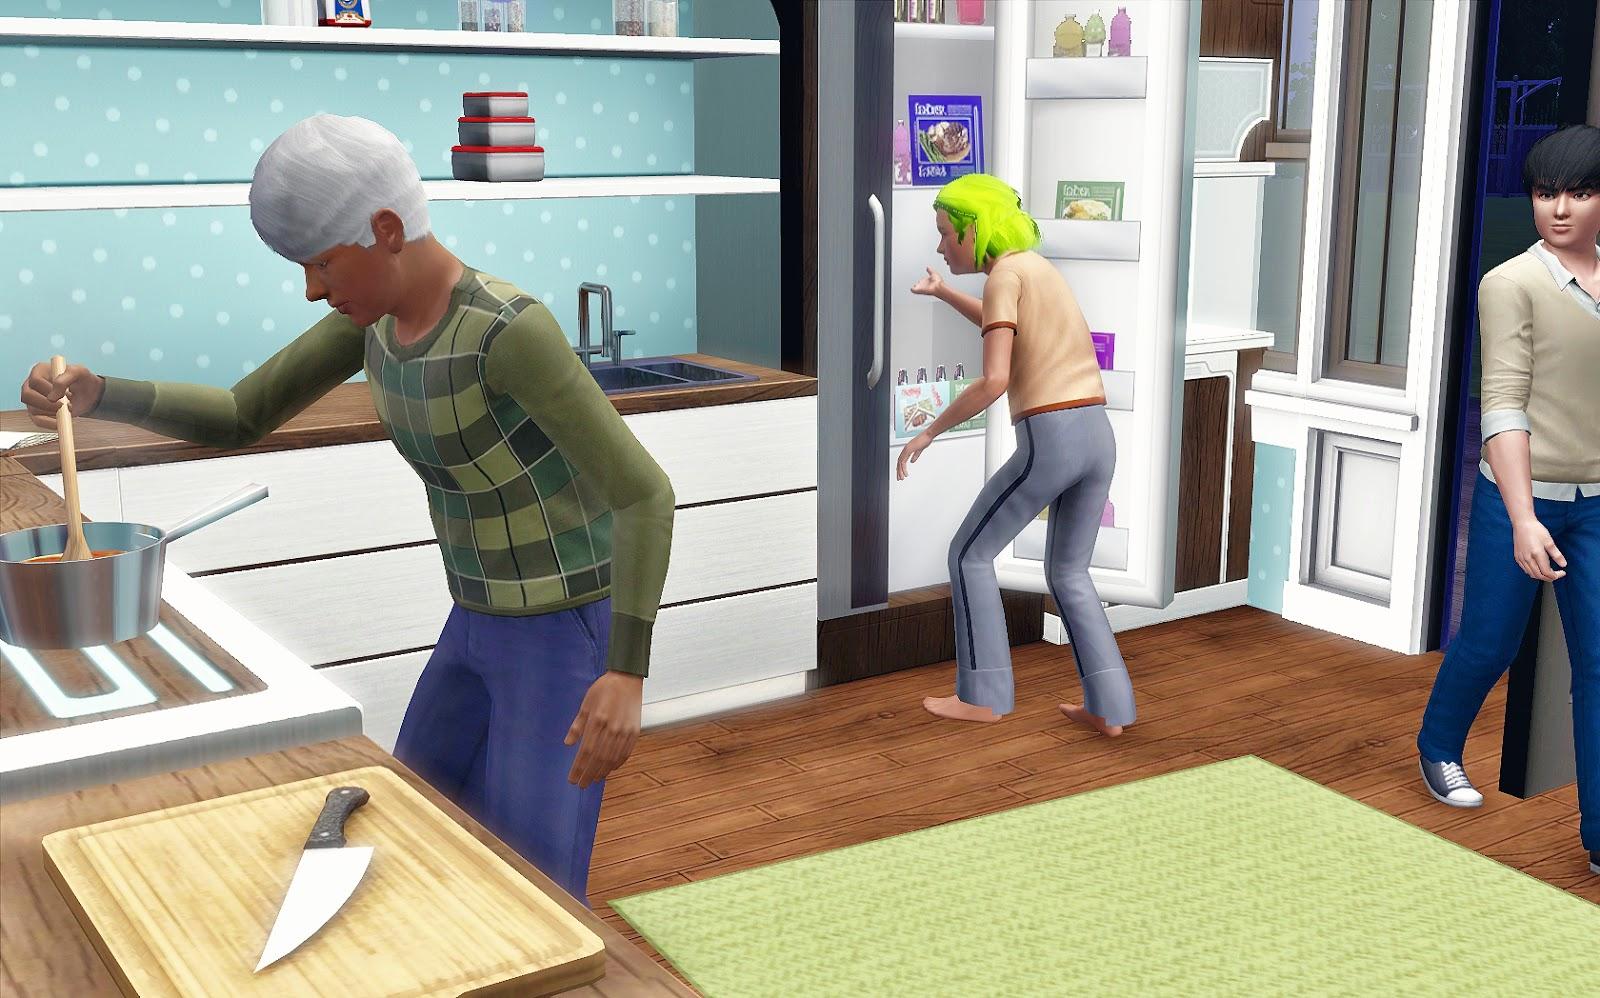 Allt Om Sims: PGC Hawkes, Generation 1 - Del 22